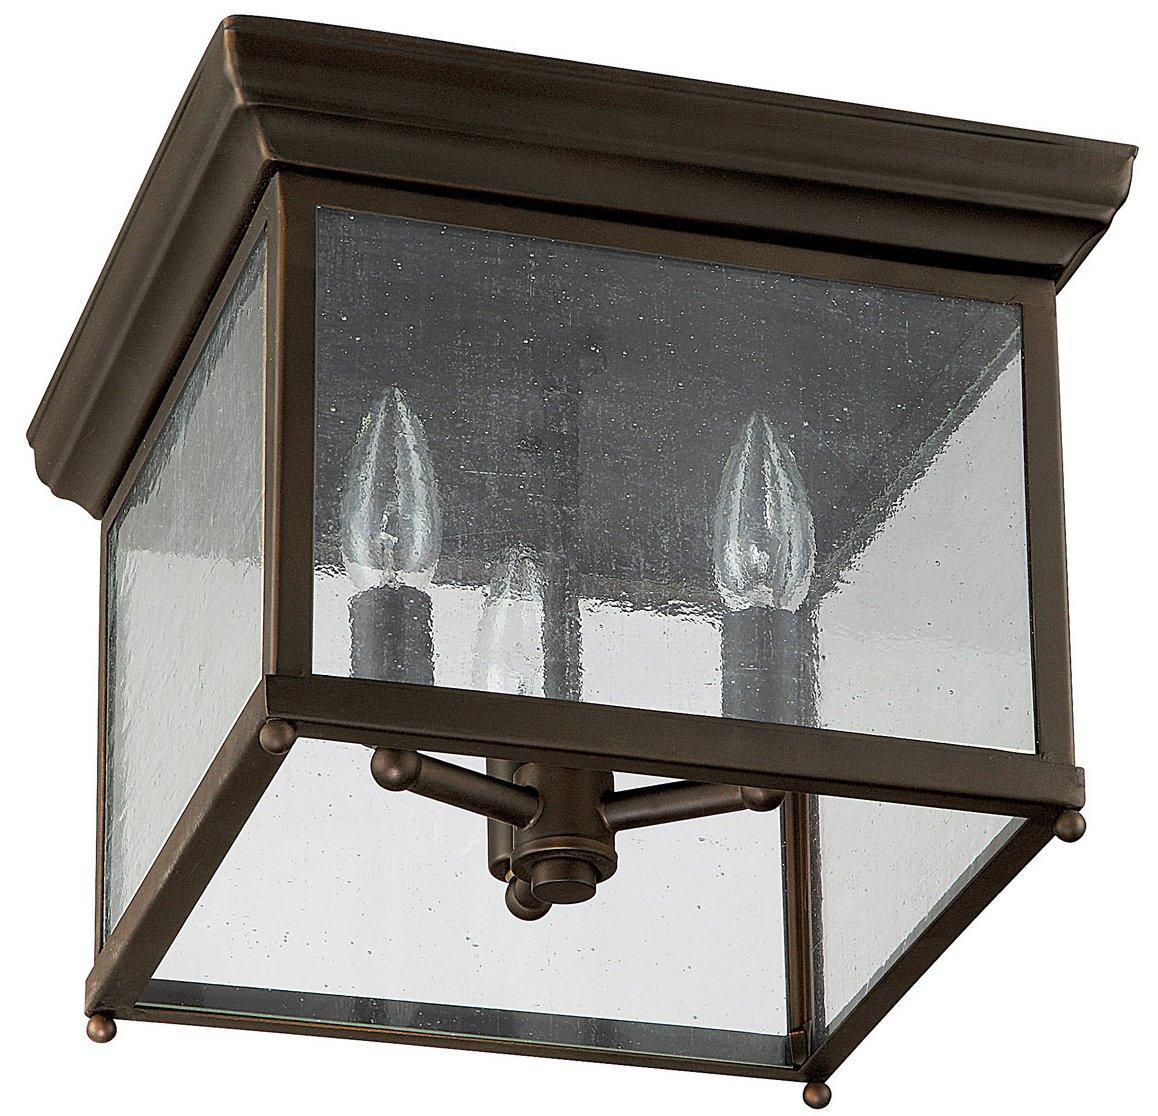 Capital Lighting 9546ob Transitional Outdoor Flush Mount Ceiling Light Cp 9546ob